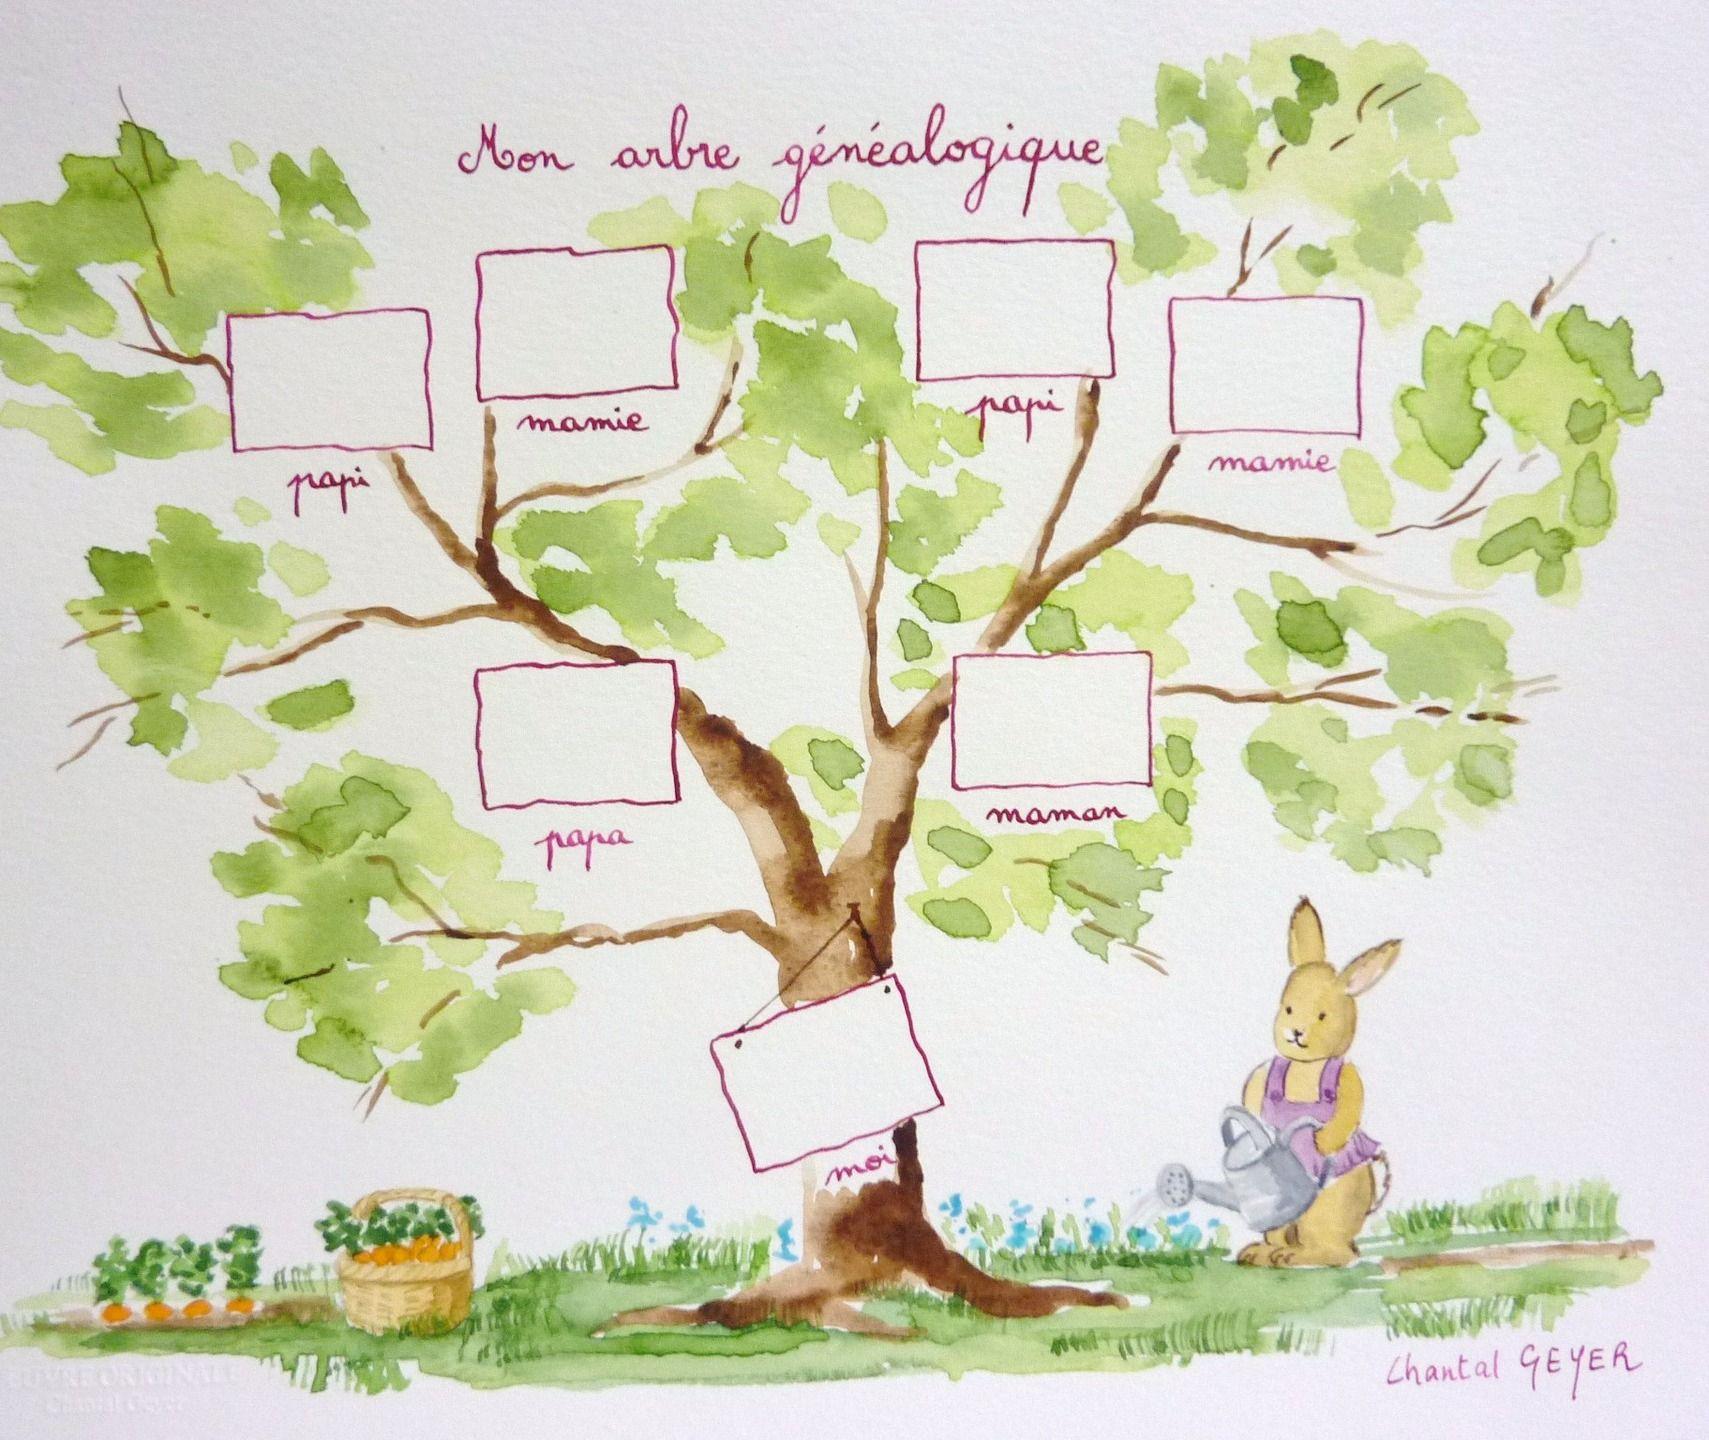 Arbre Genealogique A Remplir 3 Generations Ascendantes